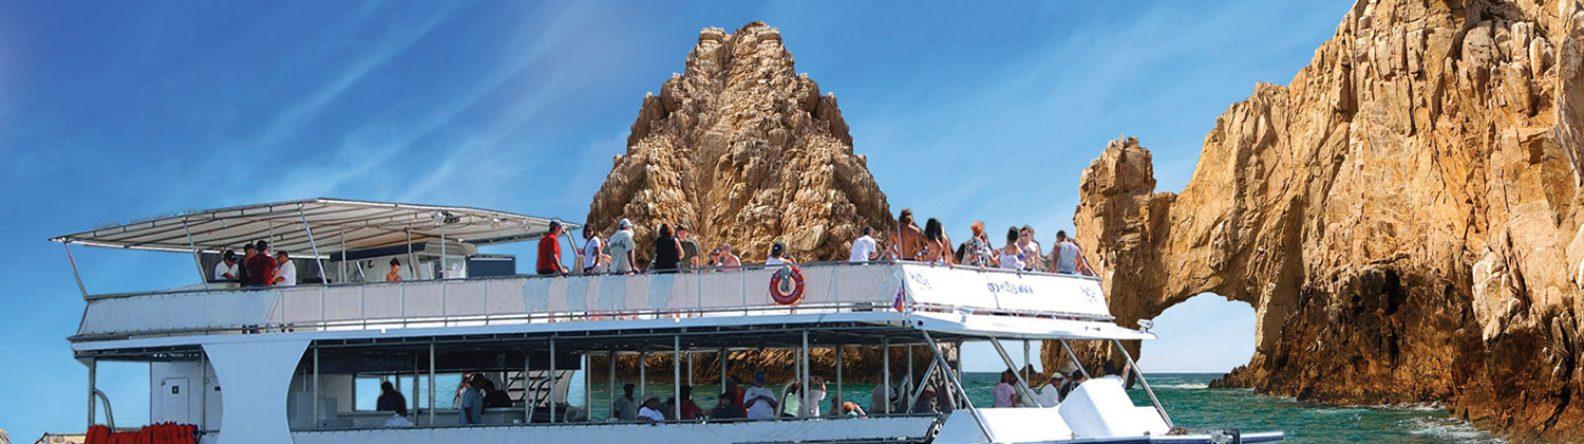 catamaran-los-cabos-tour